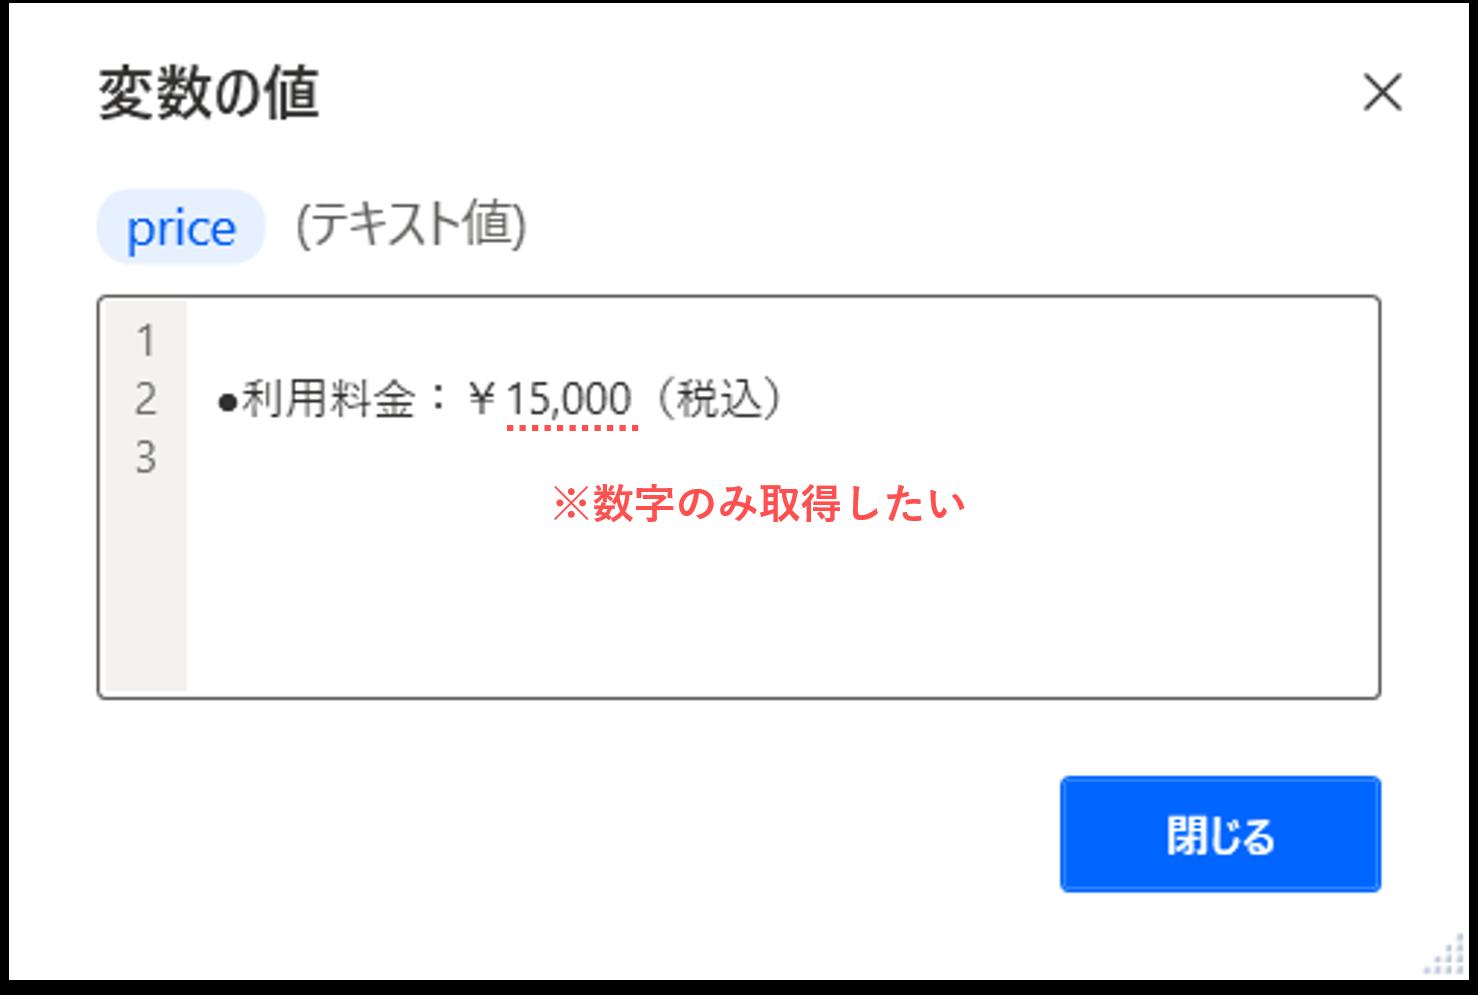 extracted price